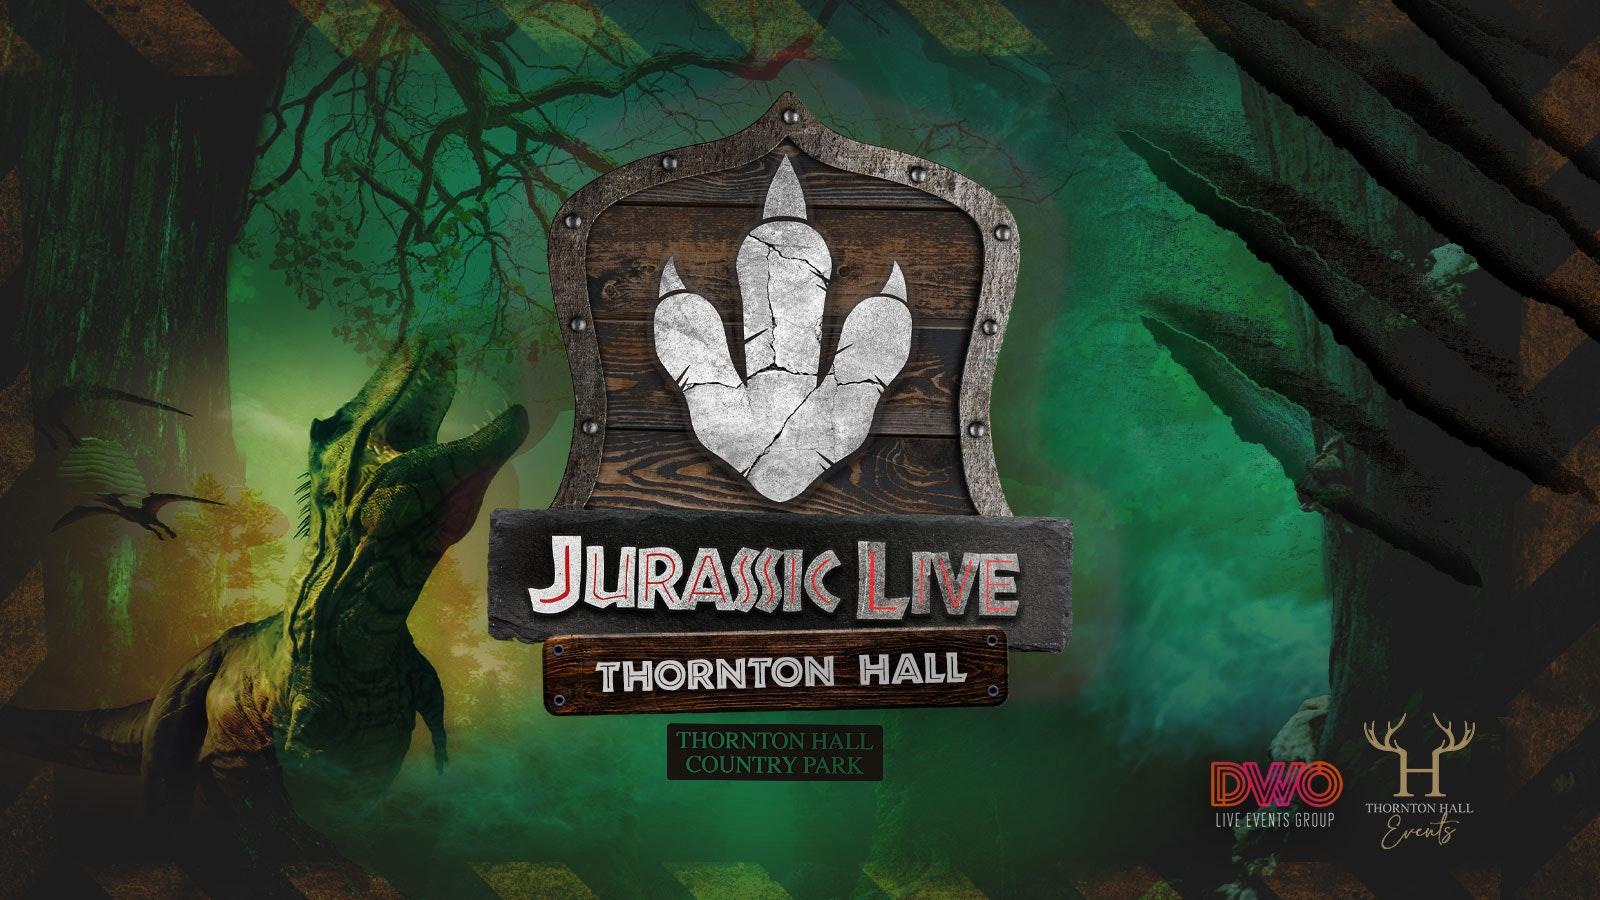 Jurassic Live – Sunday 4th April – 4pm